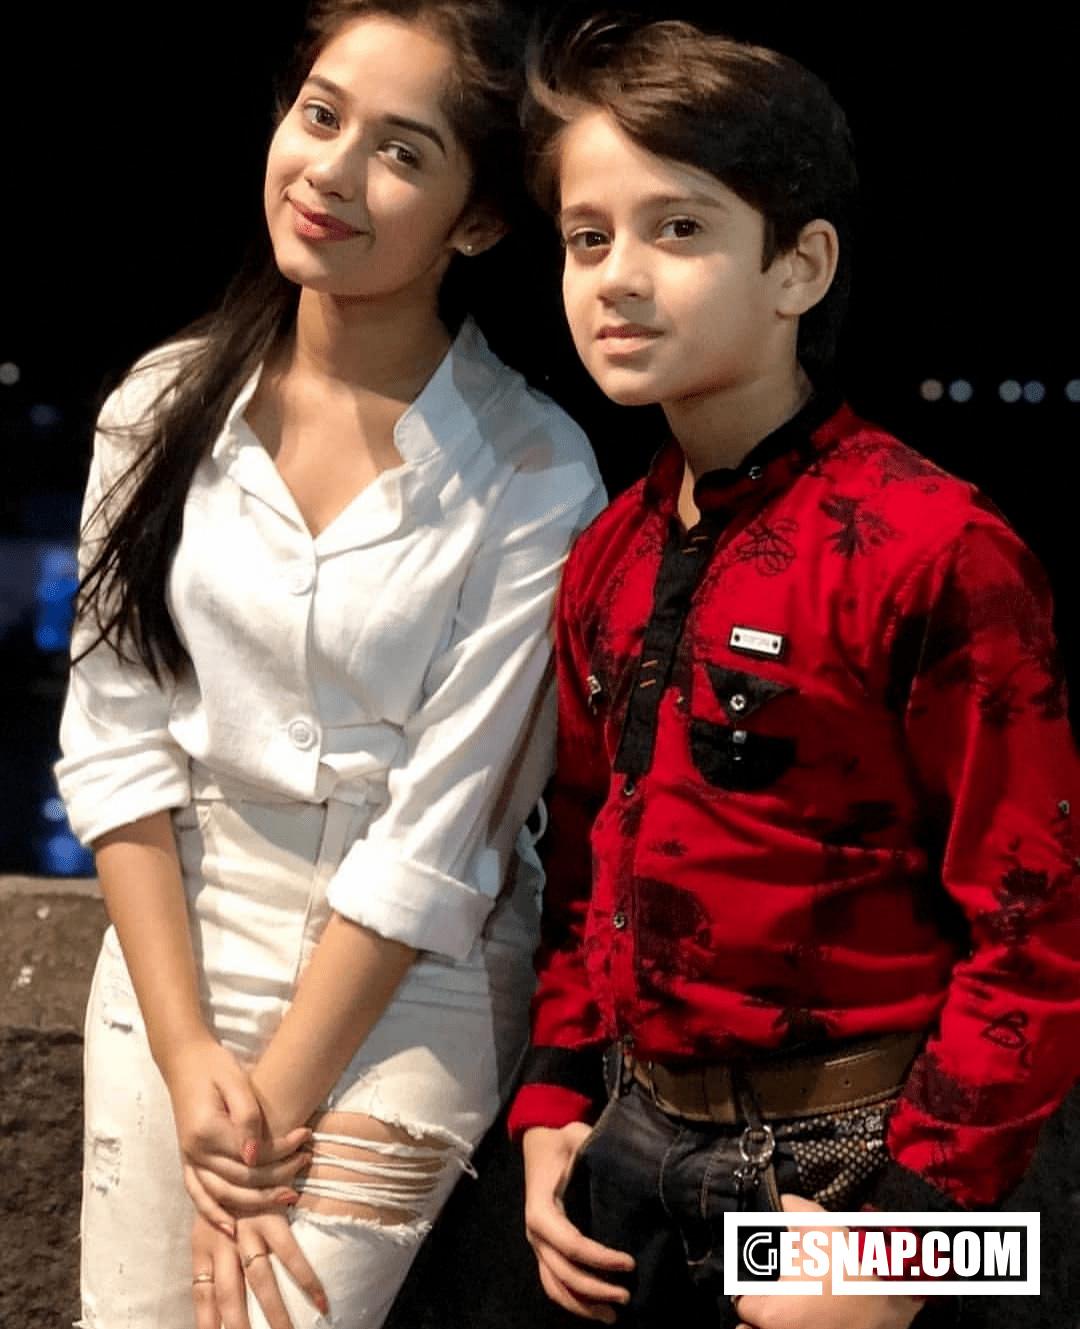 Jannat Zubair Rahmani Photo | Gesnap.com